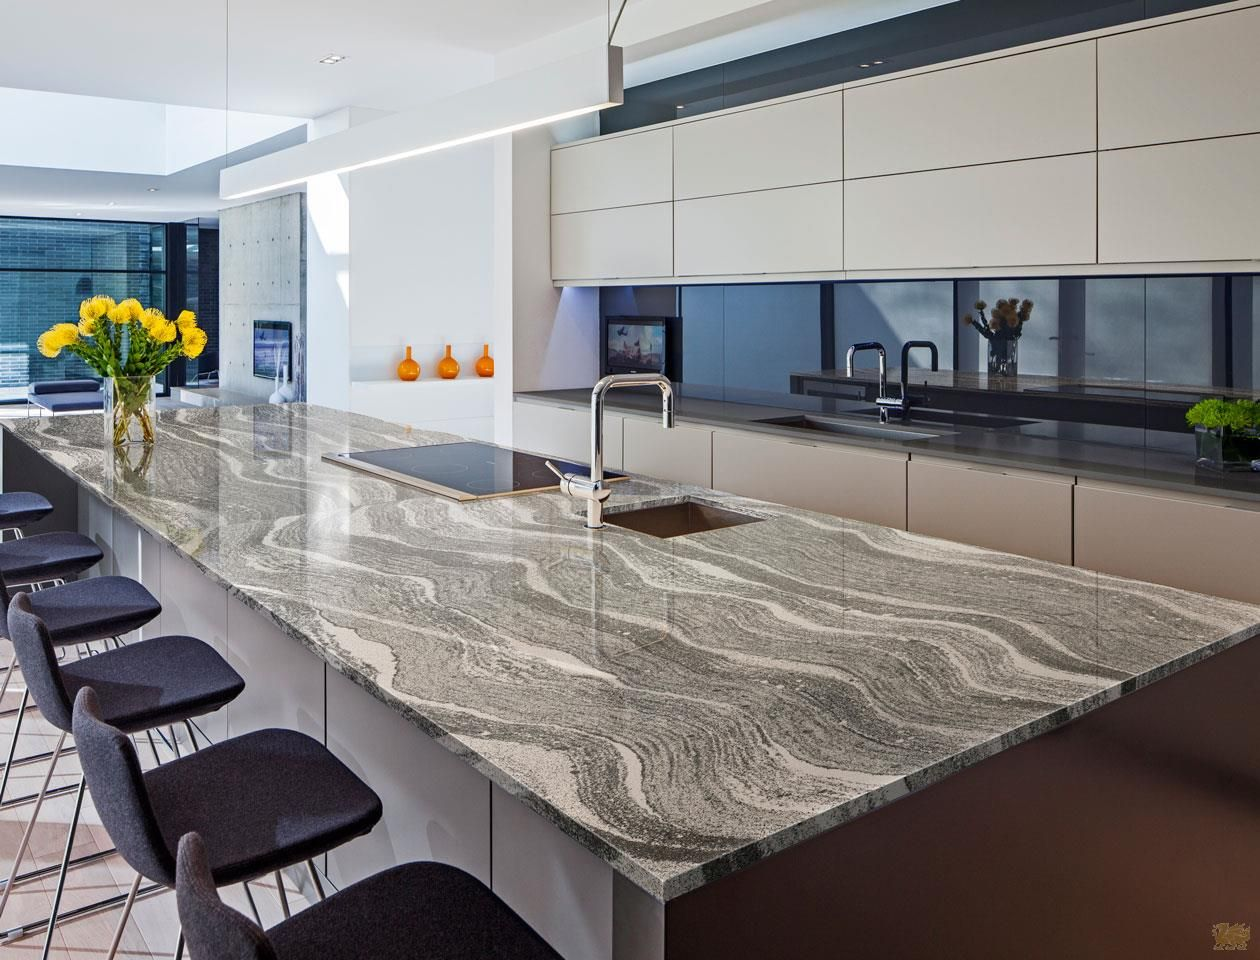 Image Result For Cambria Roxwell Quartz Popular Kitchen